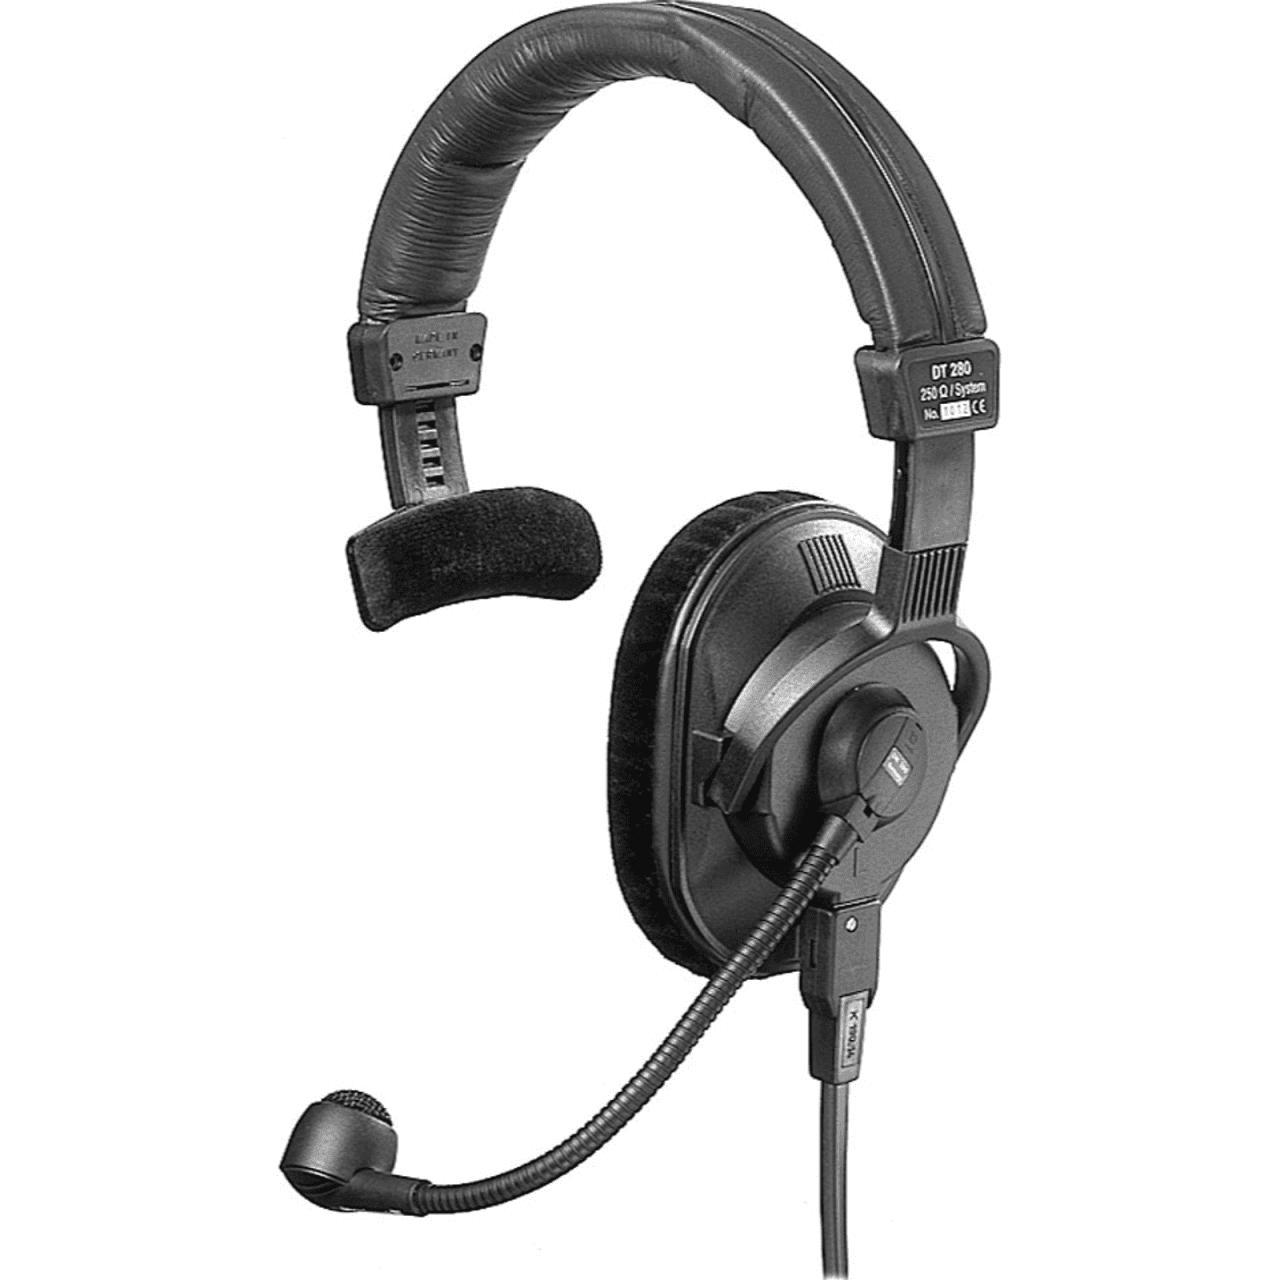 beyerdynamic dt280 mkii single ear headset with mic reverb. Black Bedroom Furniture Sets. Home Design Ideas